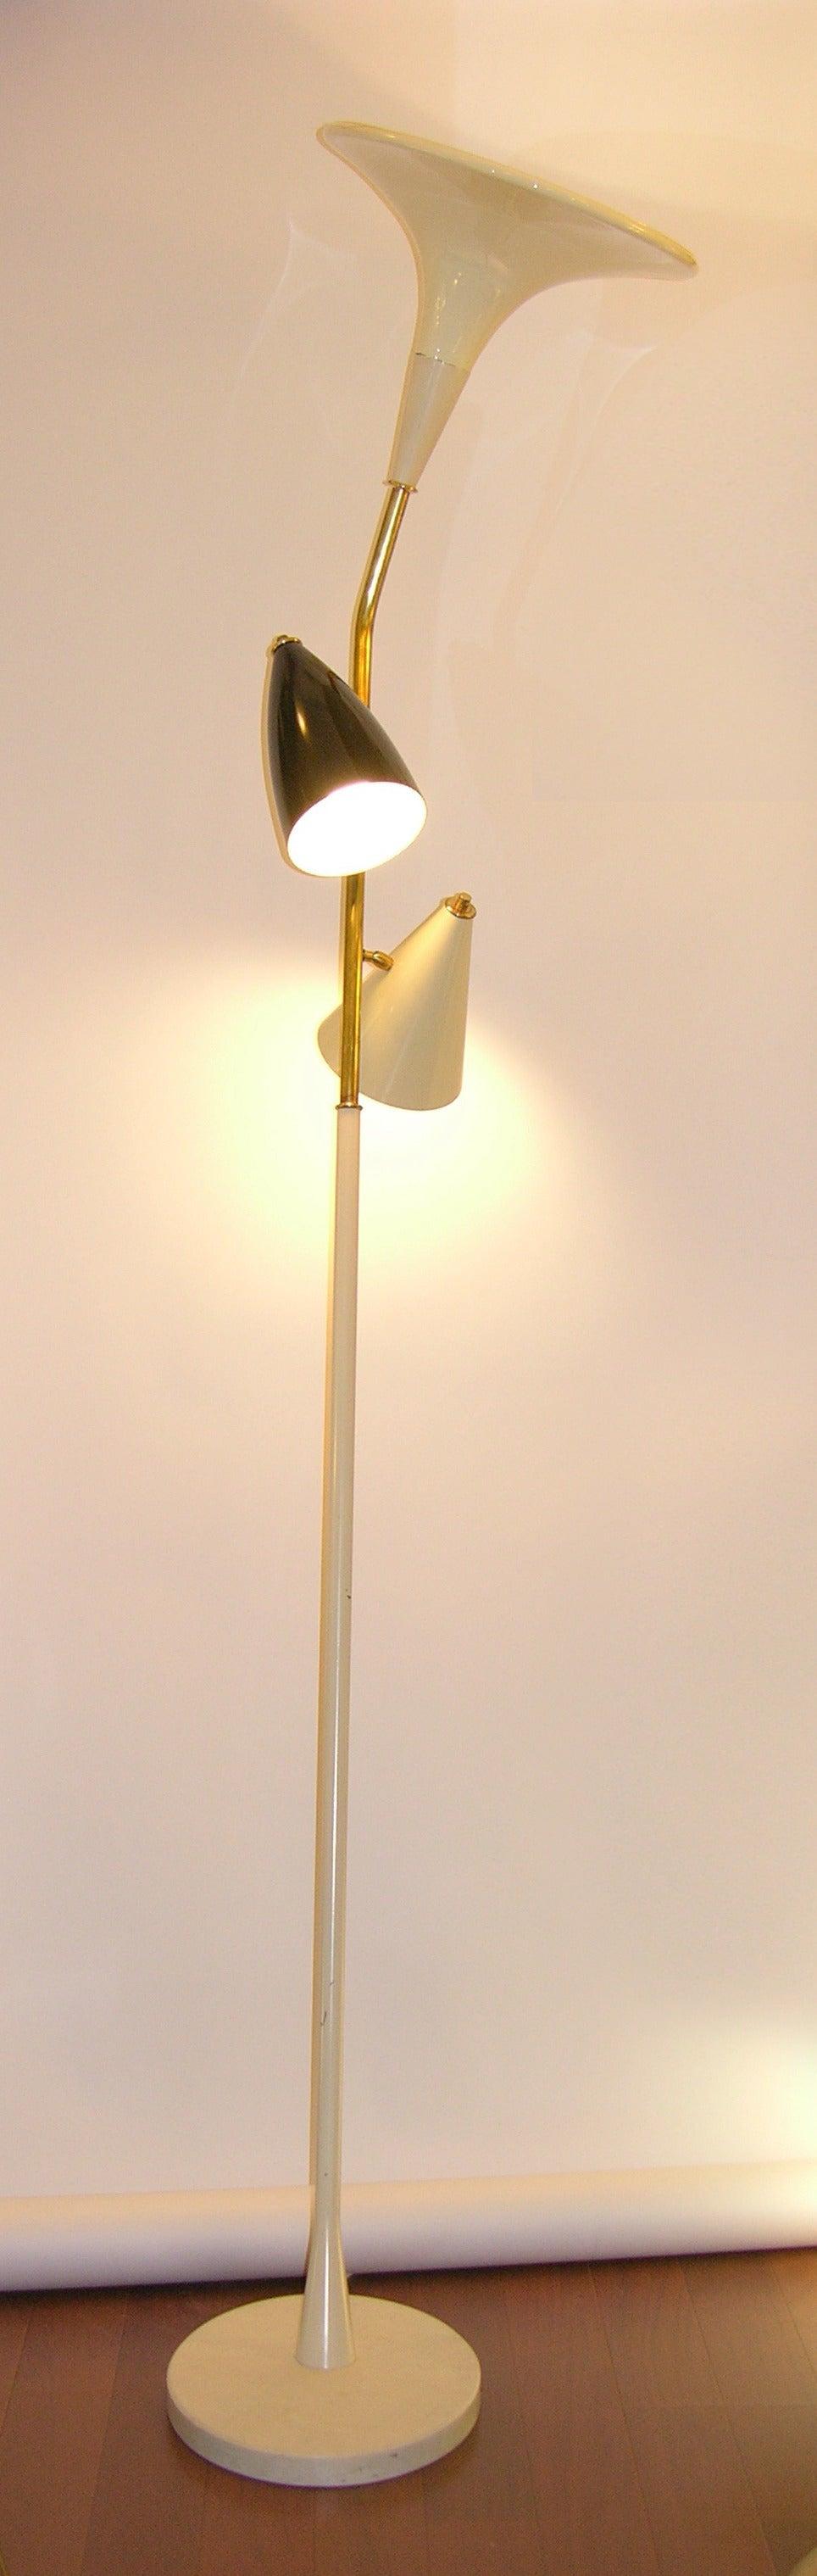 Metal 1960s Italian Black and Ivory White Modern Floor Lamp in the Style of Stilnovo For Sale